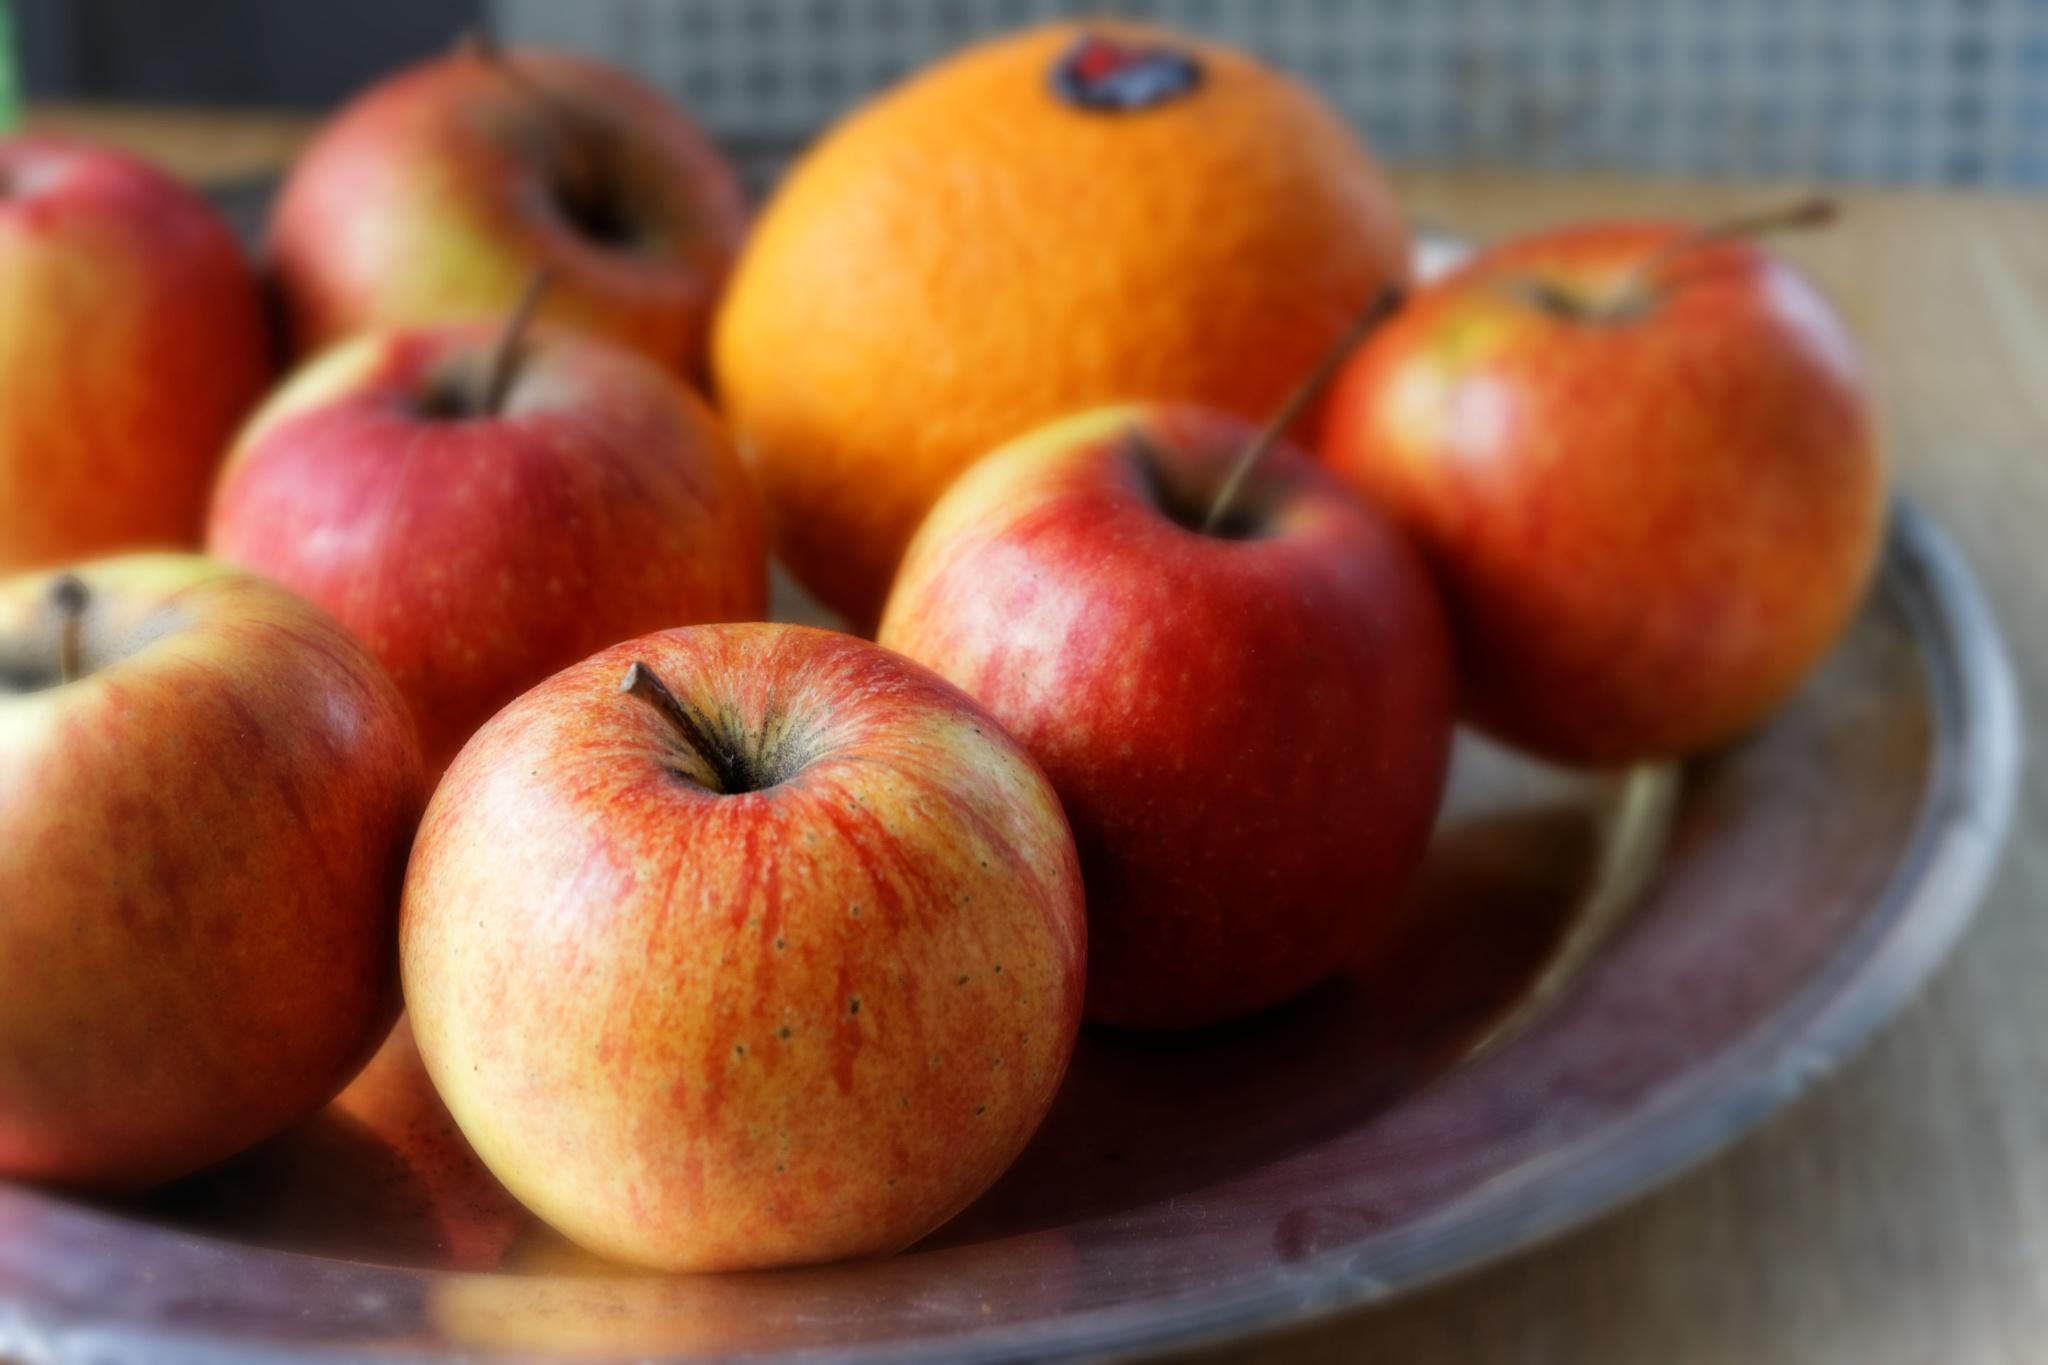 Fruits by johan.stoltwestling